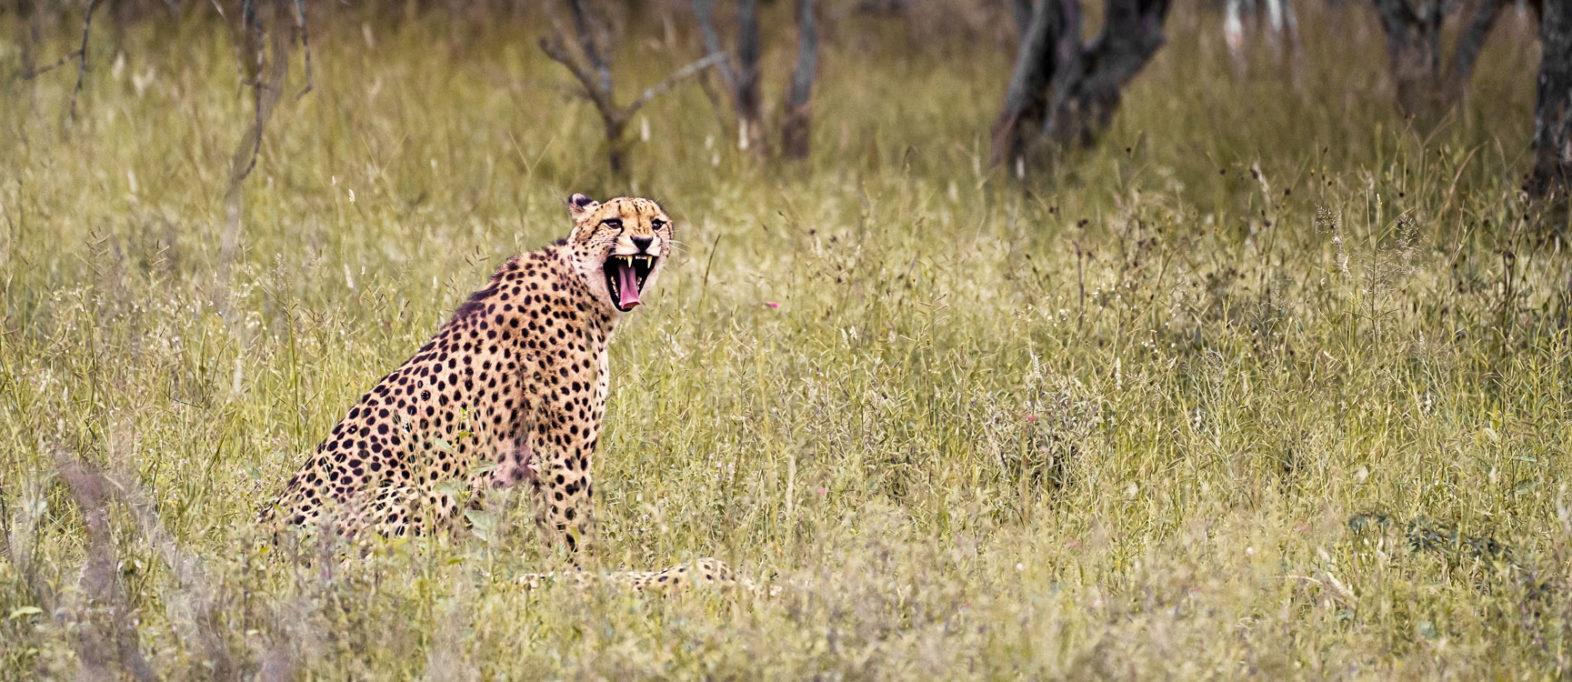 Ranger Ausbildung bei EcoTraining: Gepard